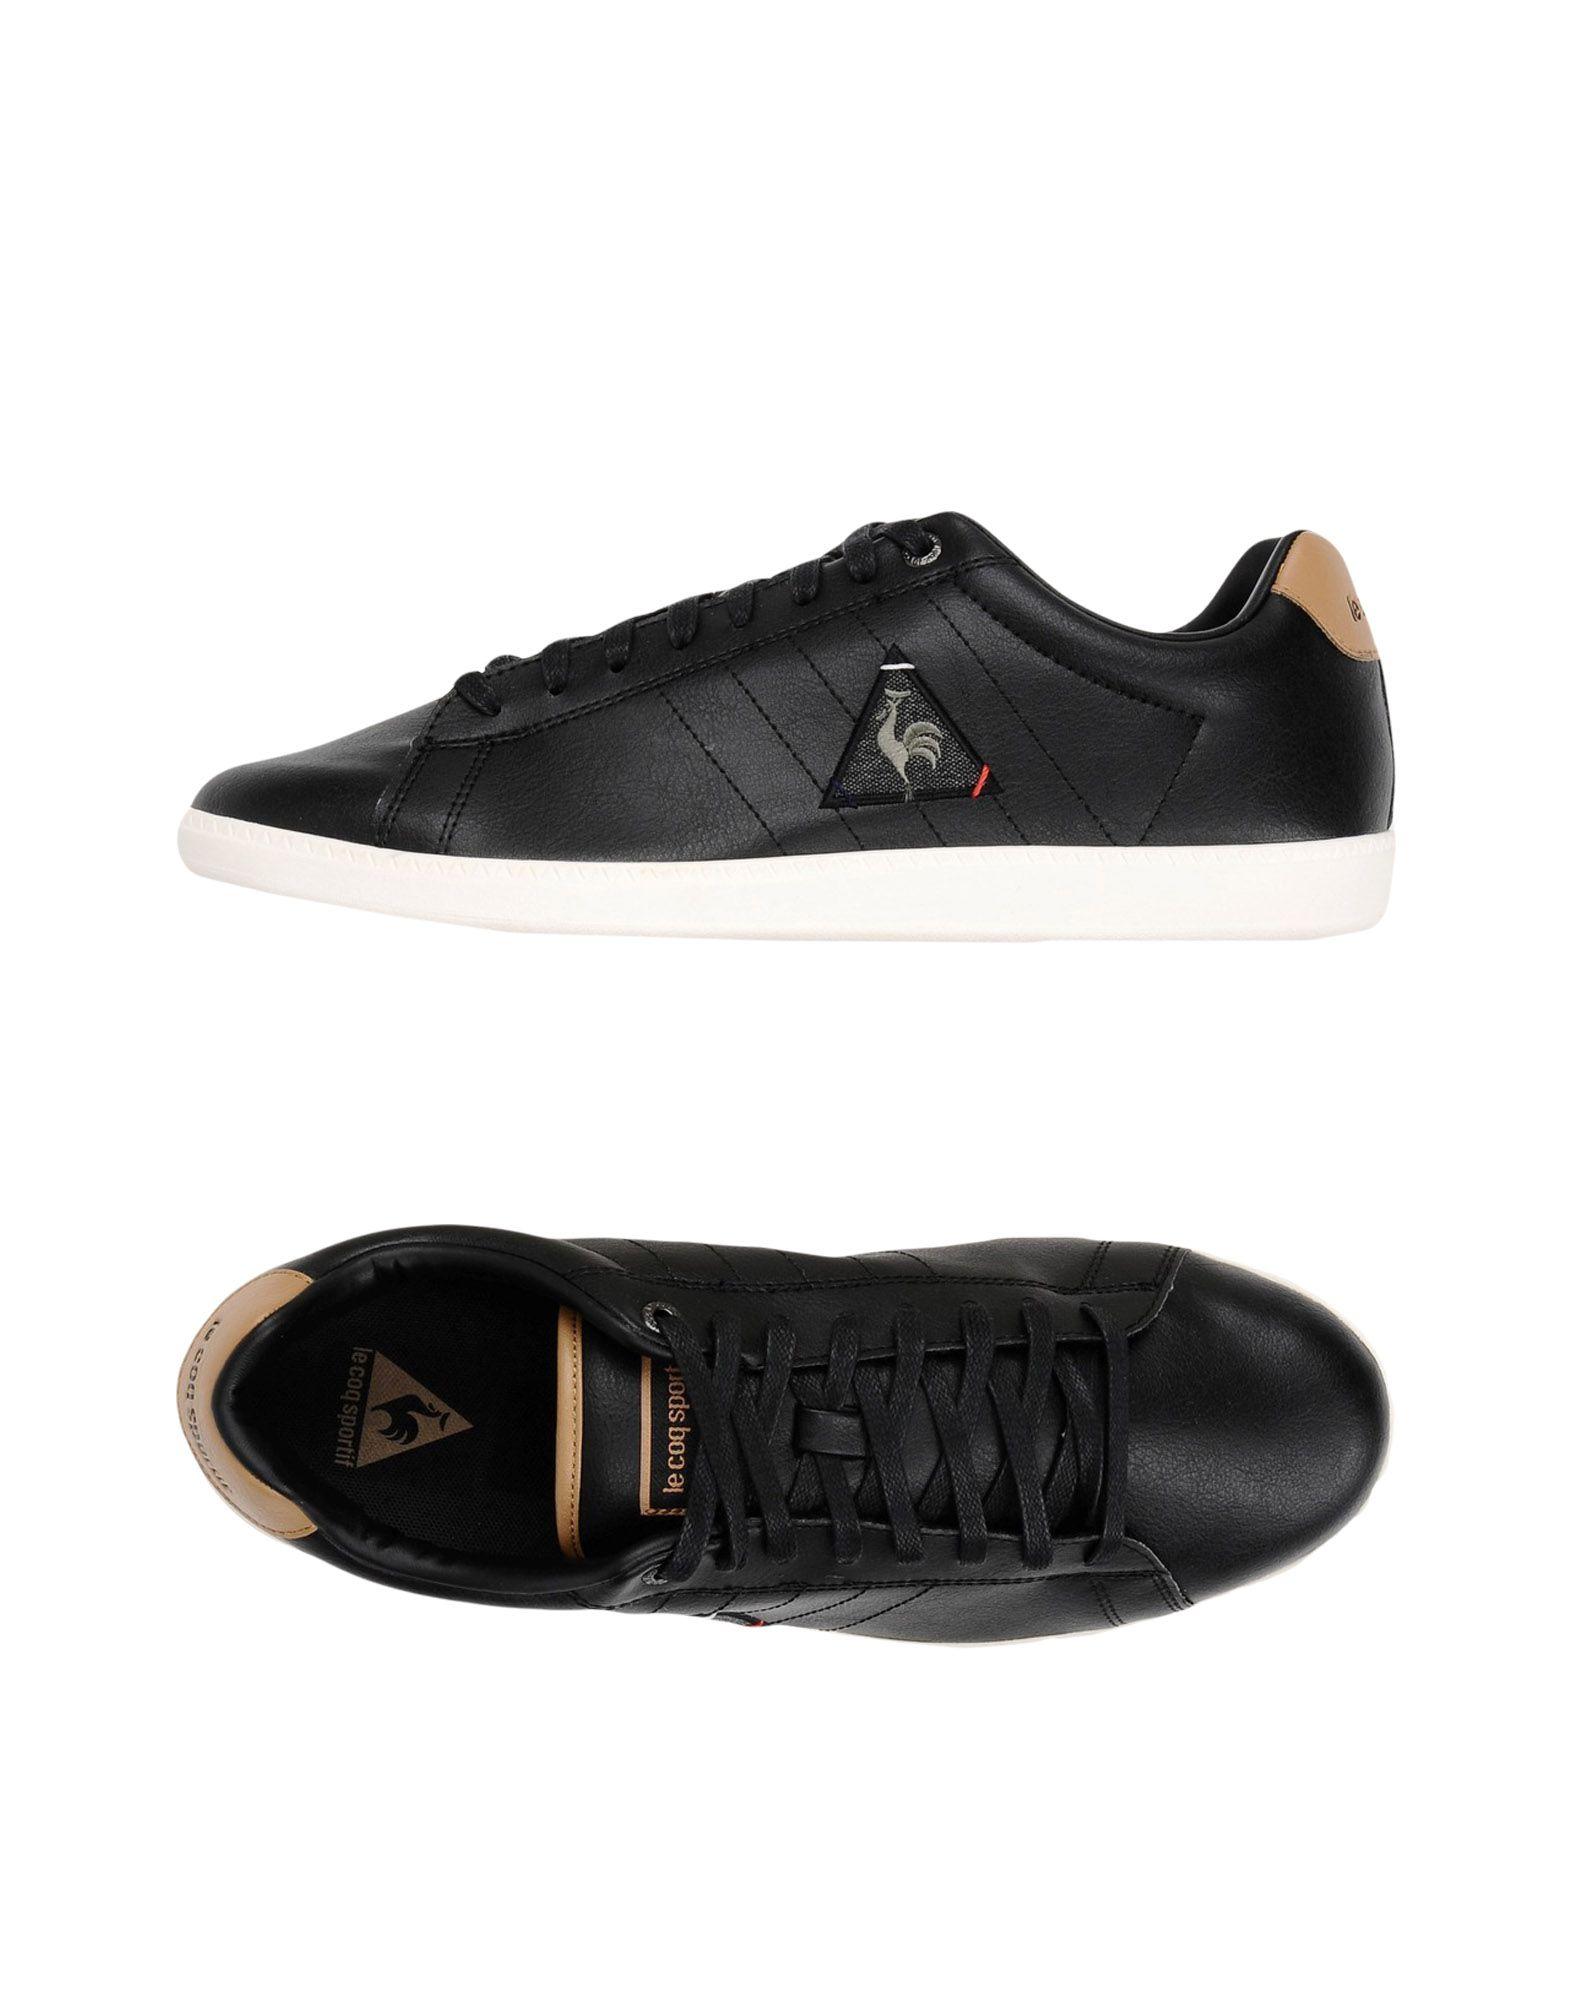 Le Coq 2 Sportif Courtcraft S Lea 2 Coq Tones - Sneakers - Men Le Coq Sportif Sneakers online on  Australia - 11368853SP 6503f5